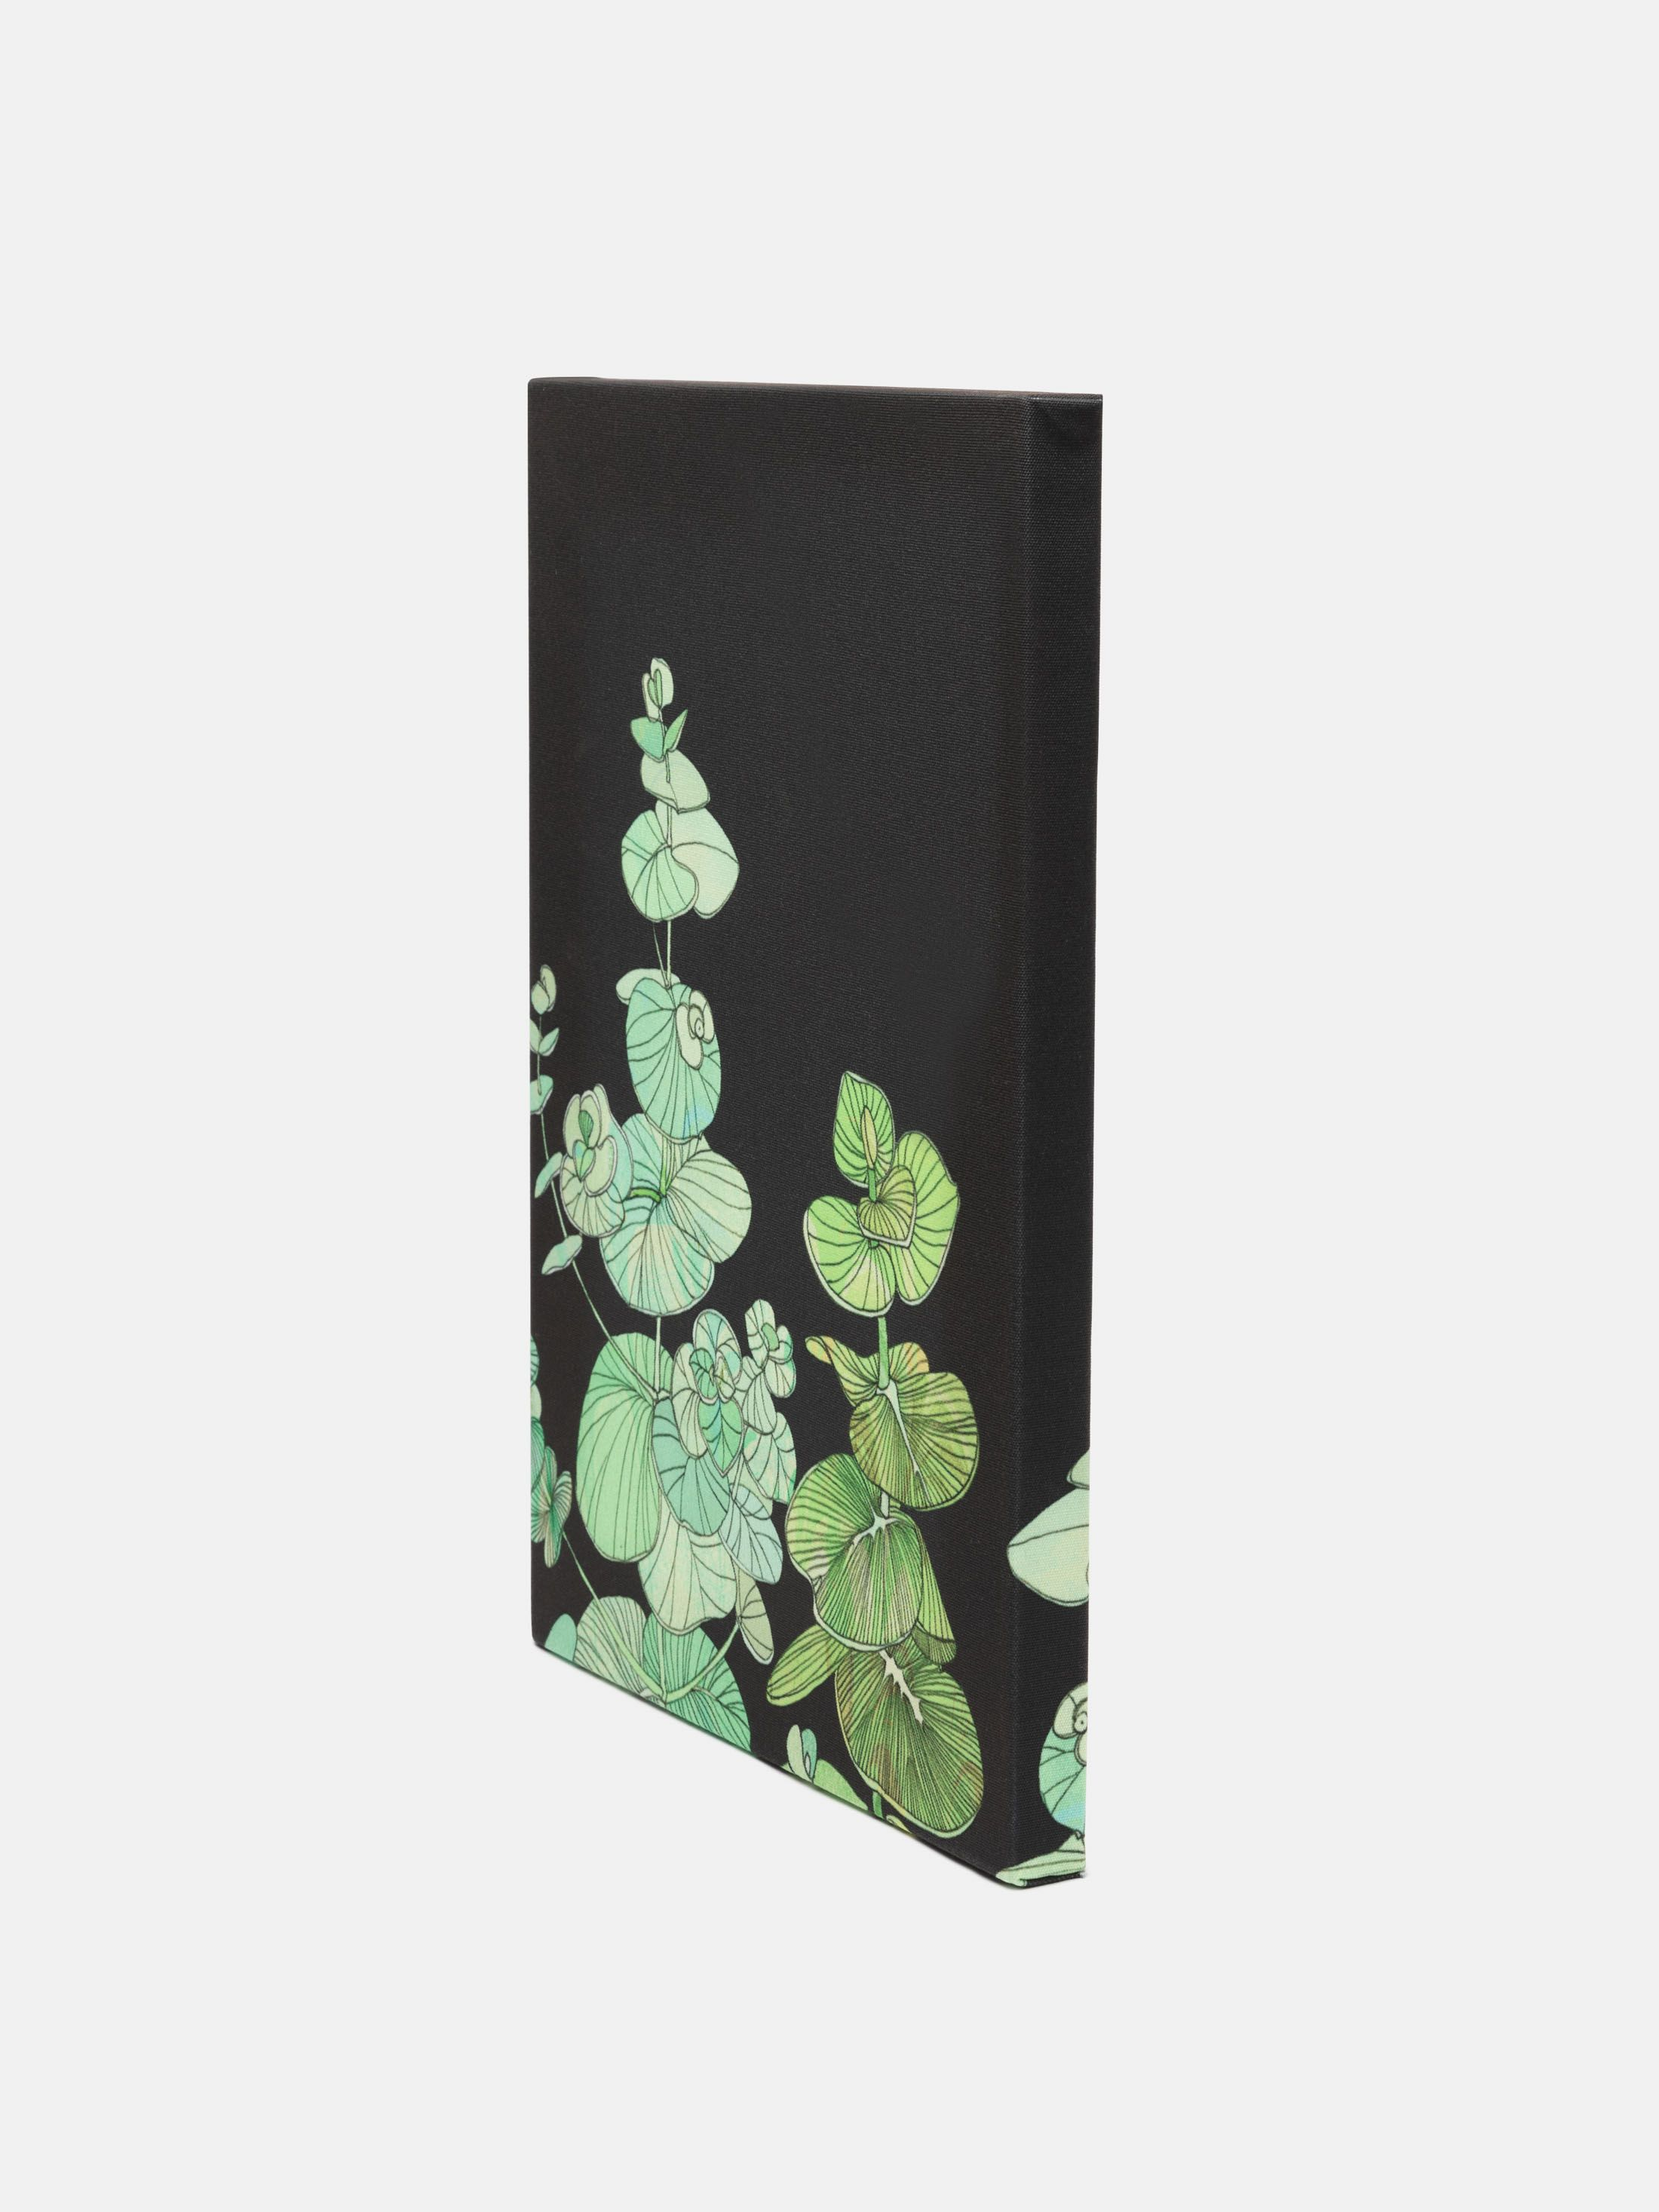 Design your own triptych canvas prints